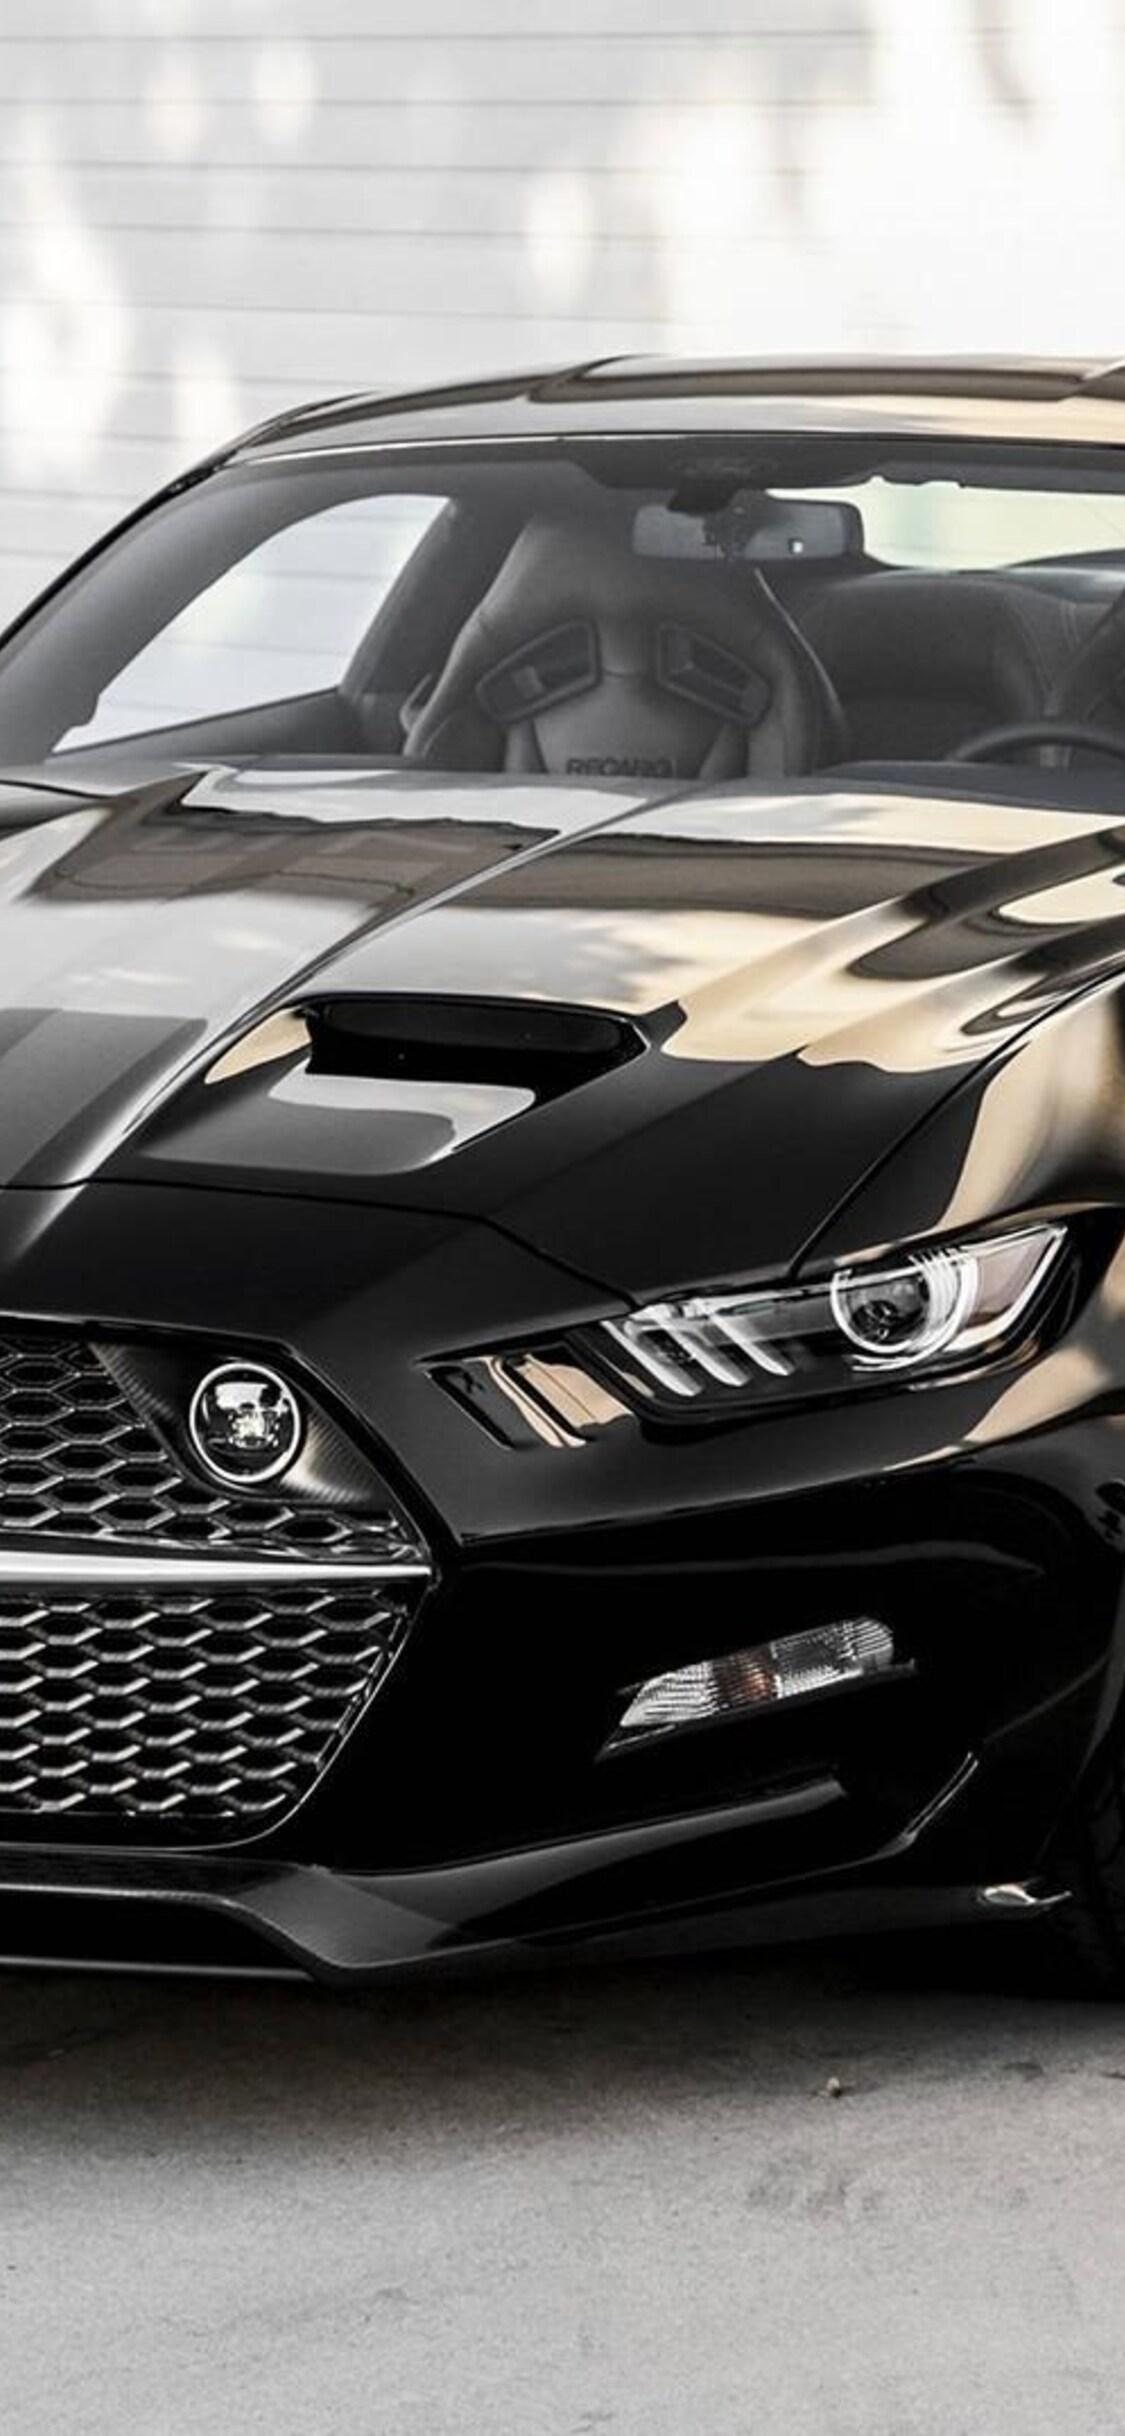 Ford Mustang Gt Black Pic Jpg